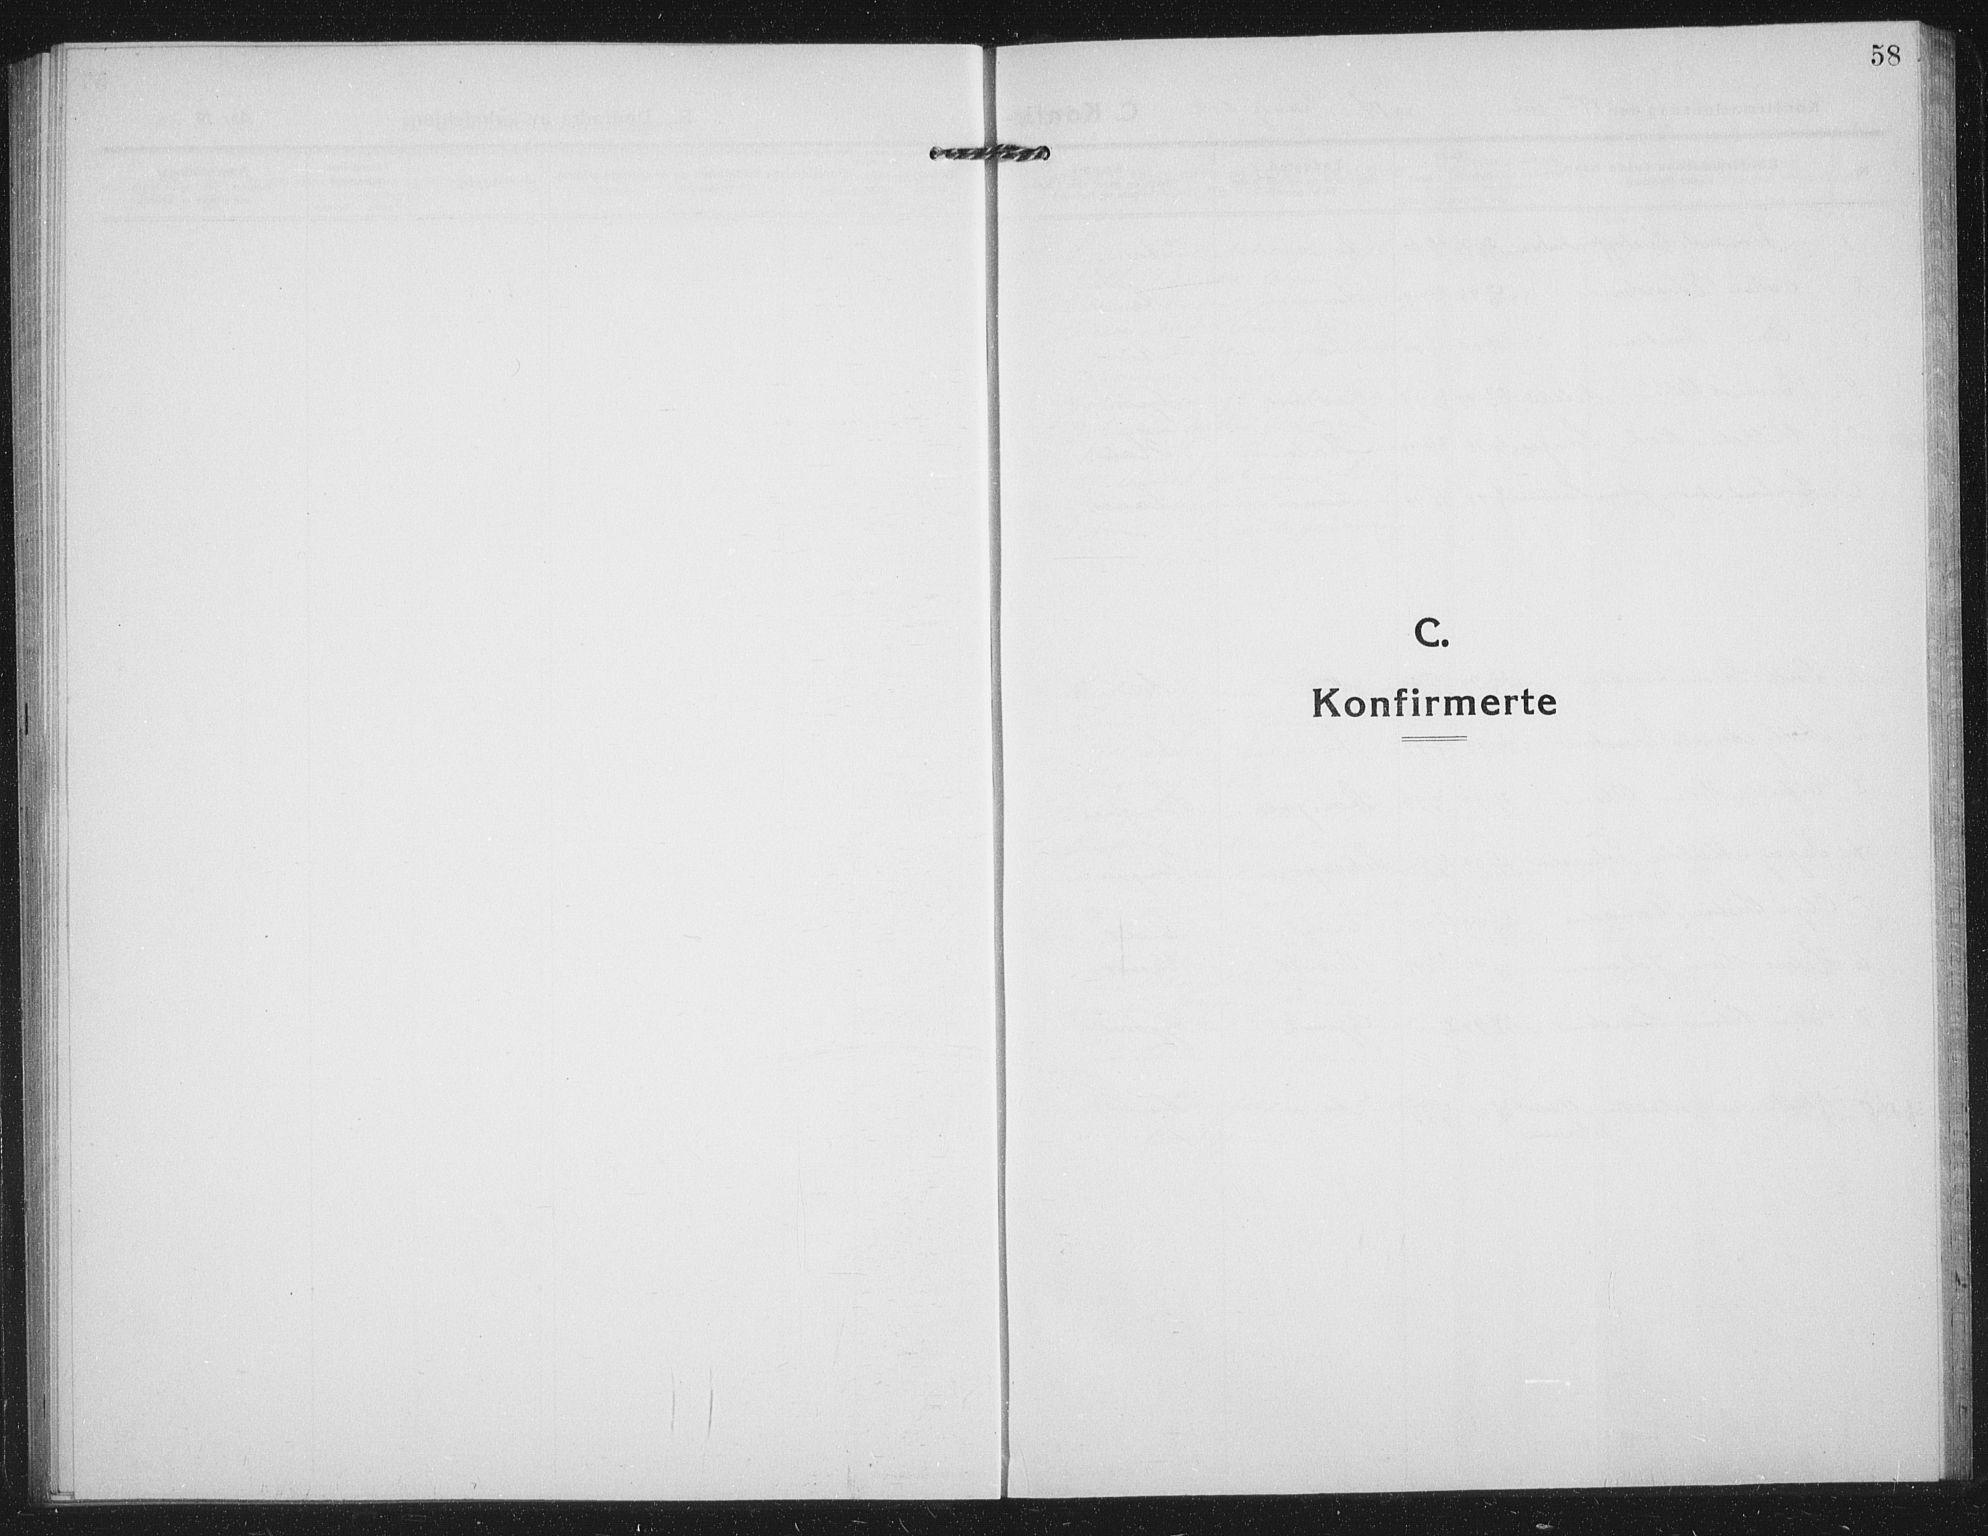 SATØ, Tranøy sokneprestkontor, I/Ia/Iab/L0019klokker: Parish register (copy) no. 19, 1914-1940, p. 58